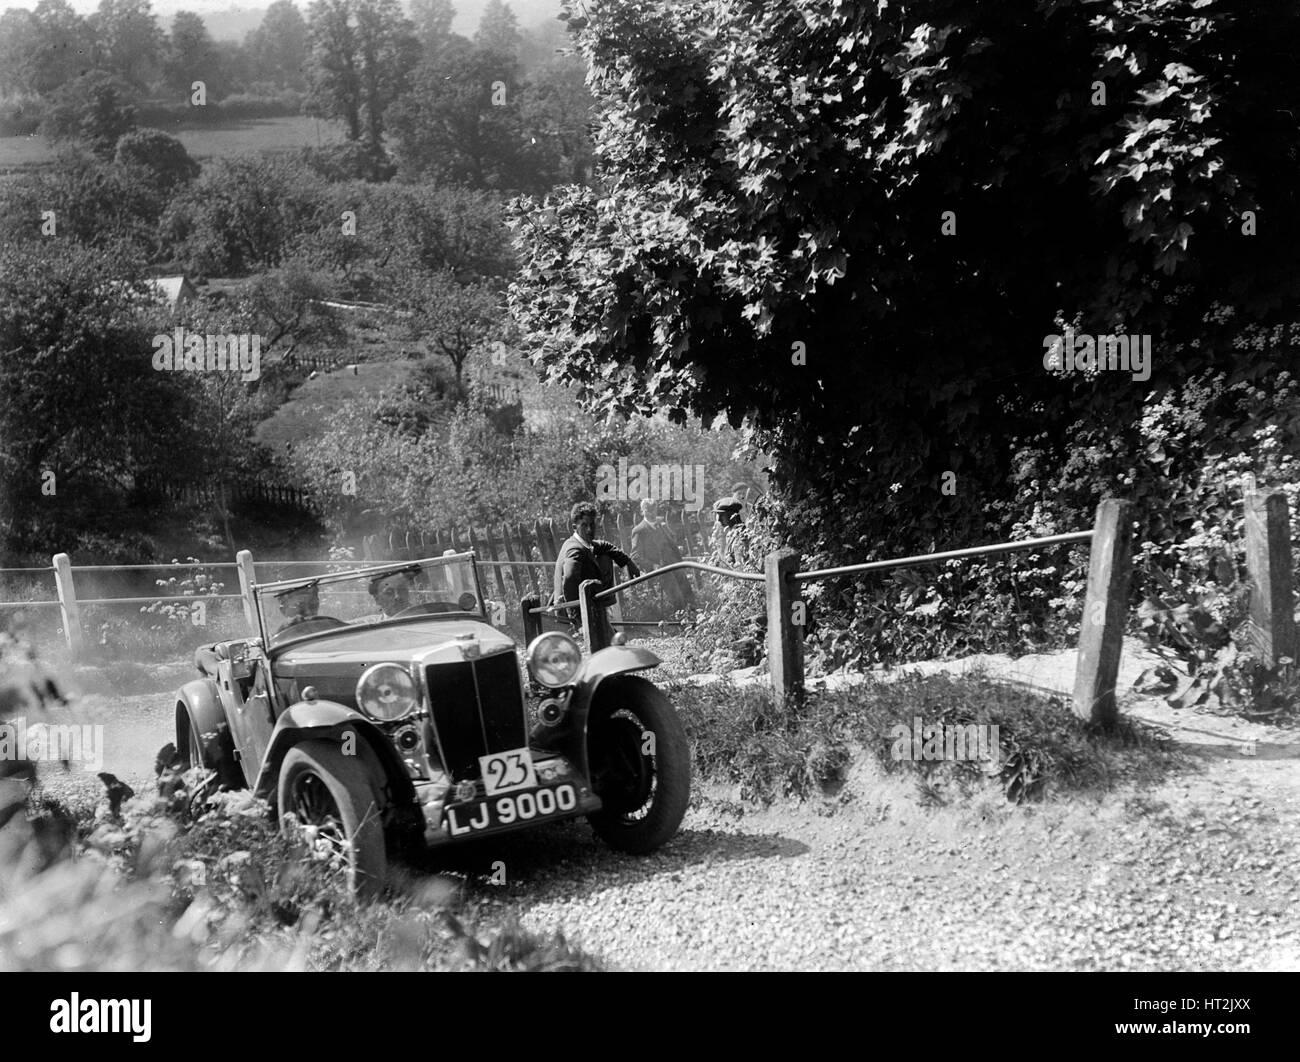 1934 MG Magnette taking part in a West Hants Light Car Club Trial, Ibberton Hill, Dorset, 1930s. Artist: Bill Brunell. - Stock Image